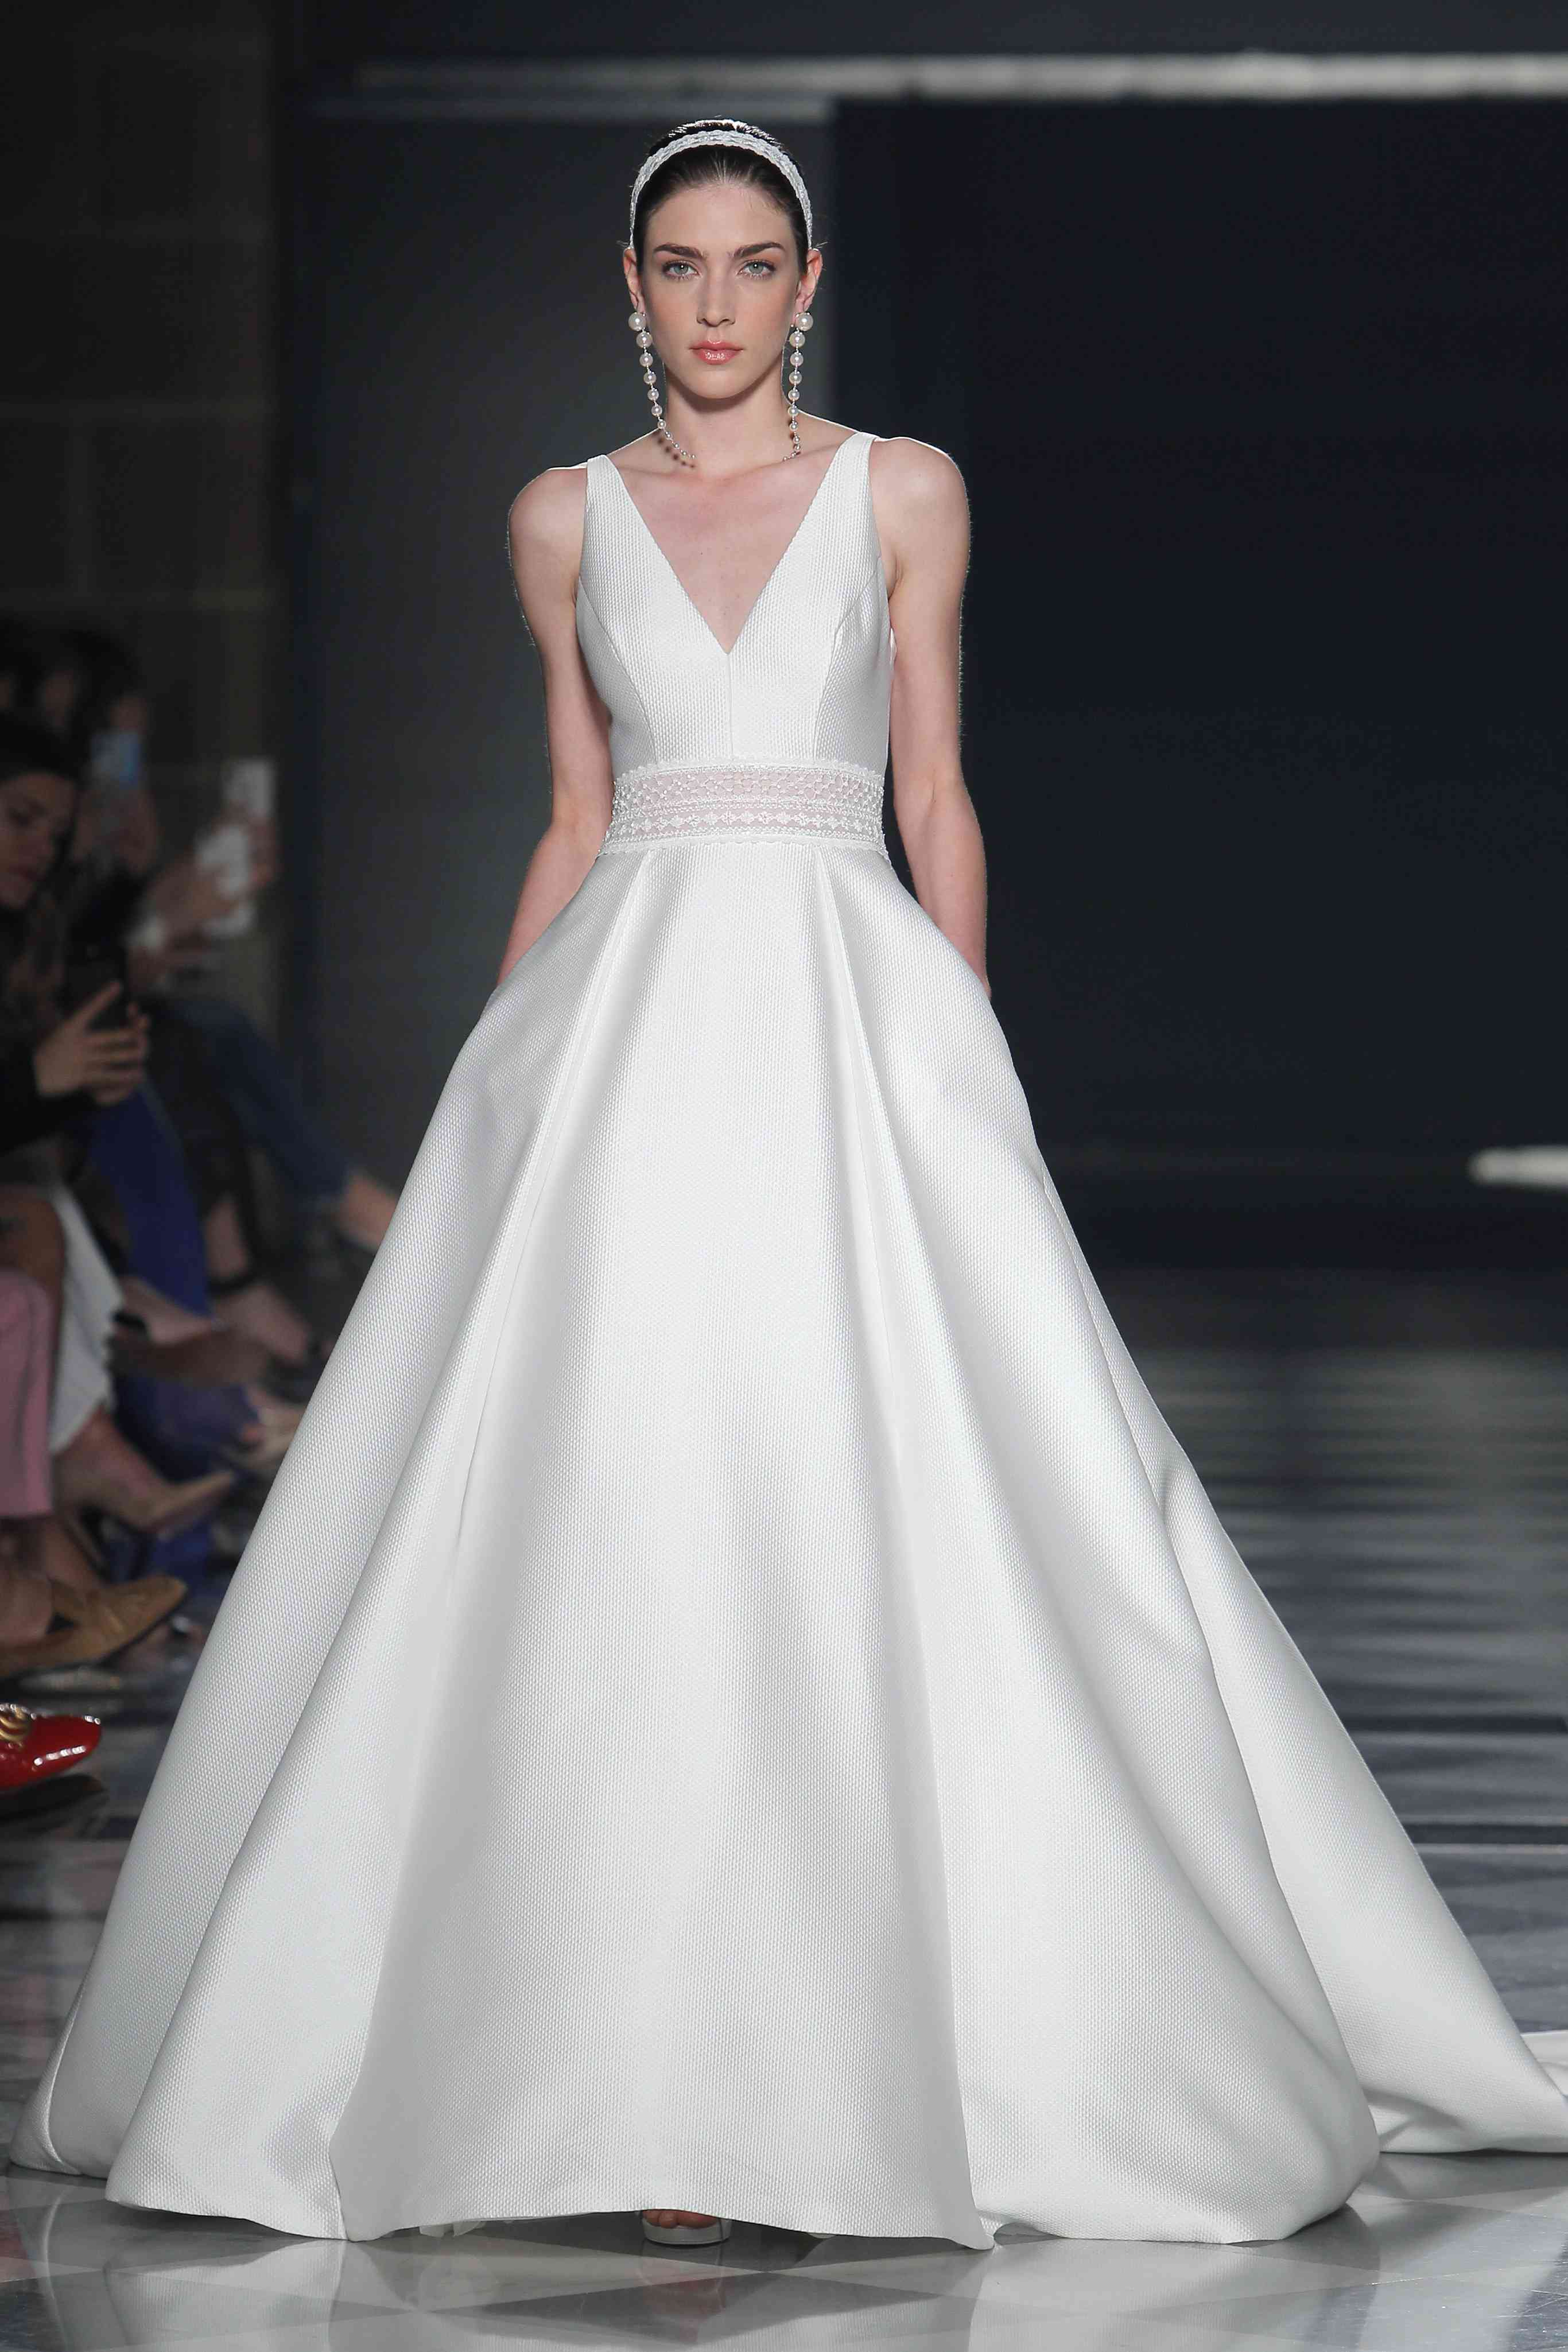 Rosa Clará model